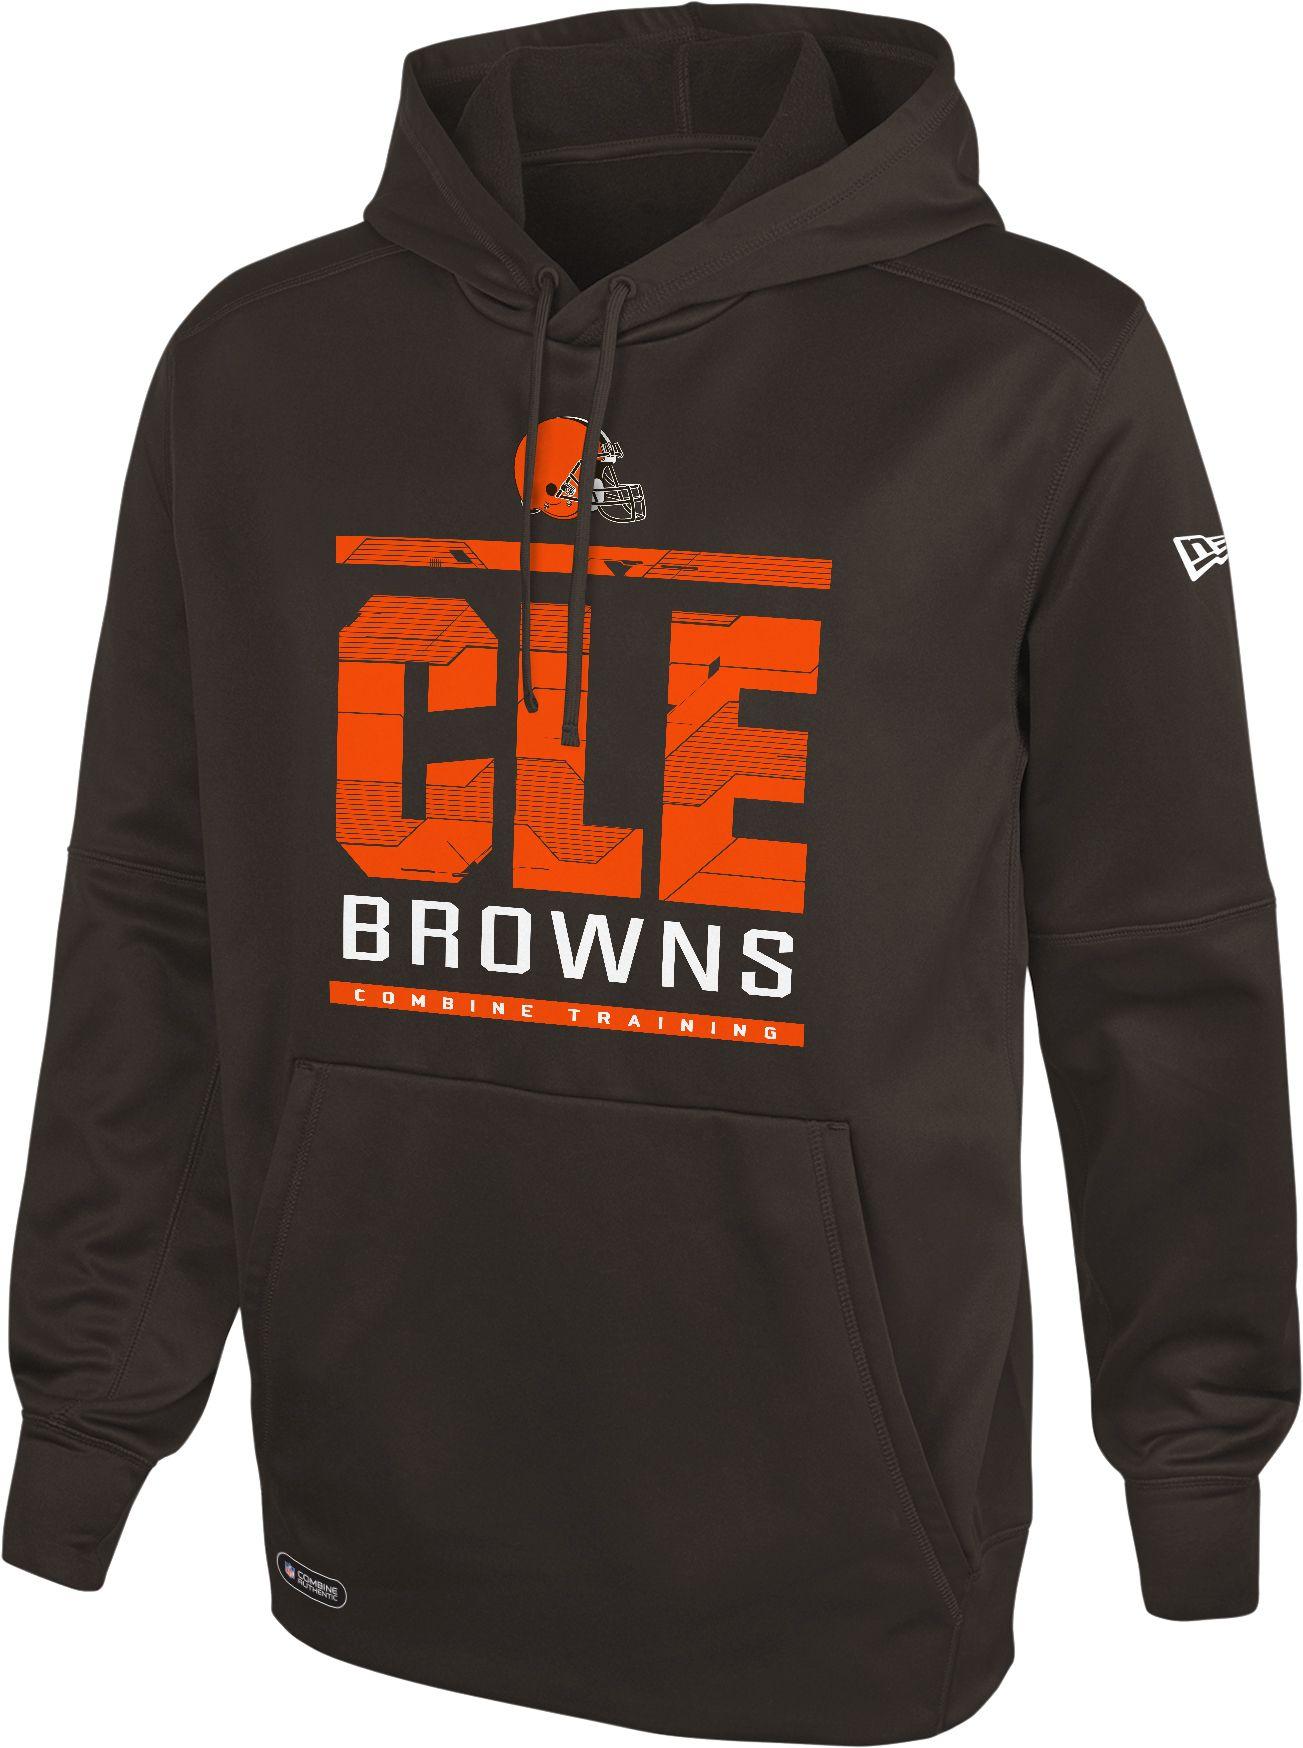 cleveland browns hooded sweatshirt